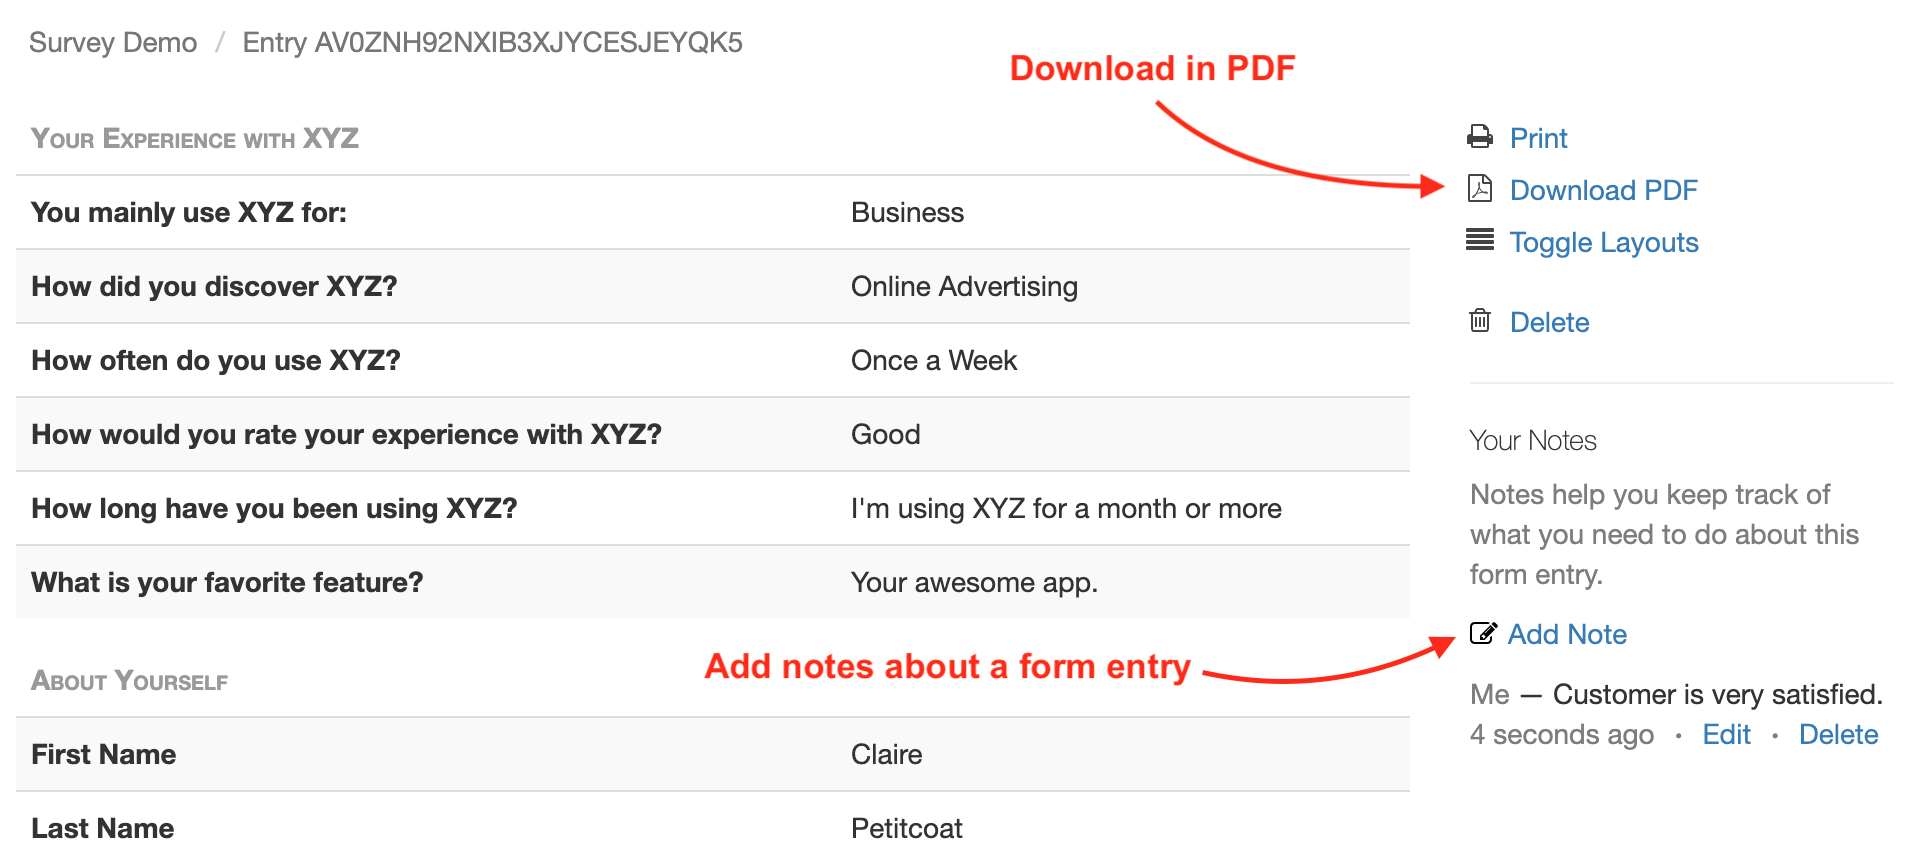 Form Response in PDF